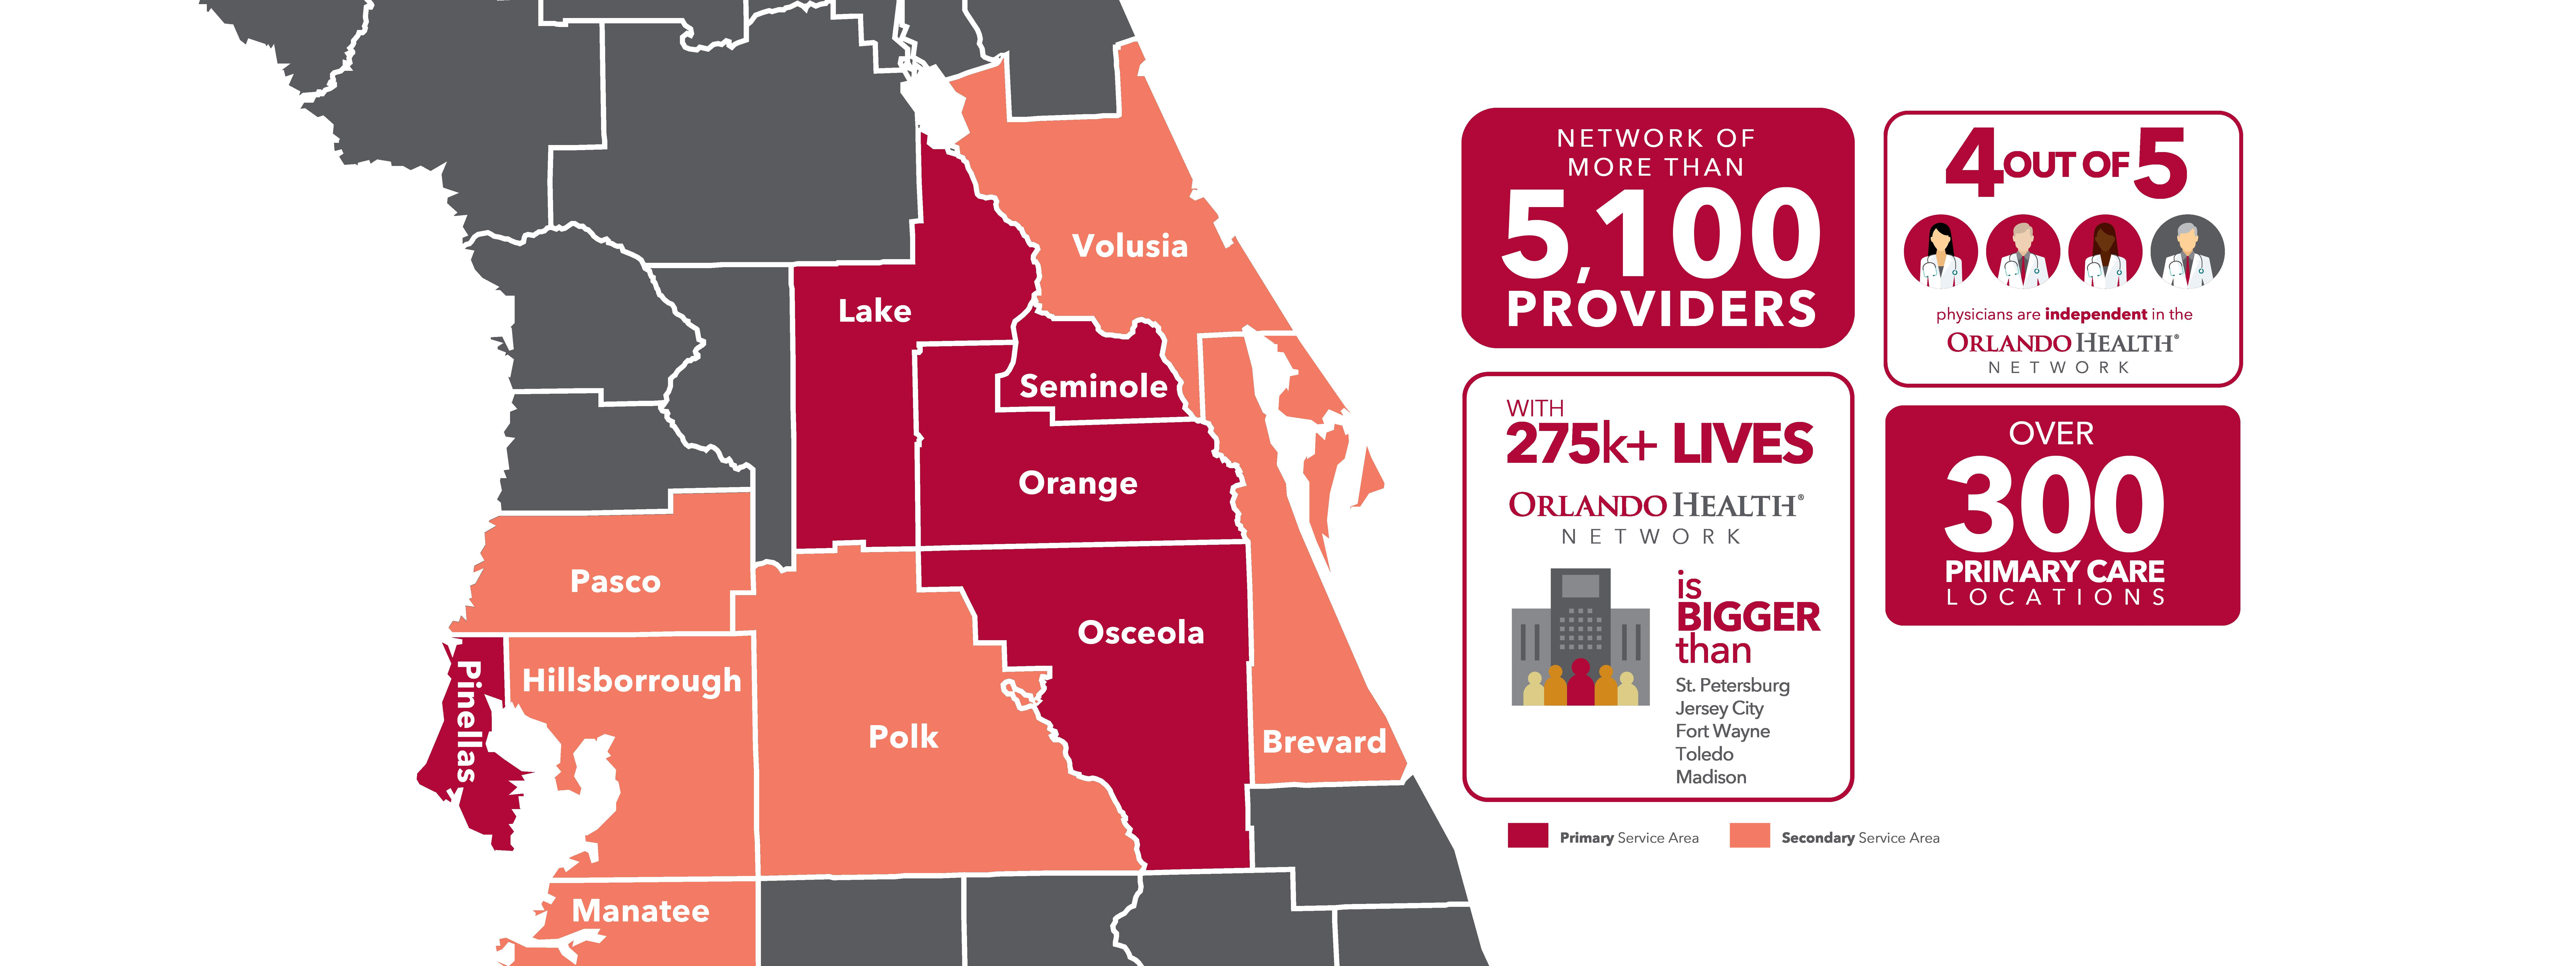 Map of Orlando Health Network service area